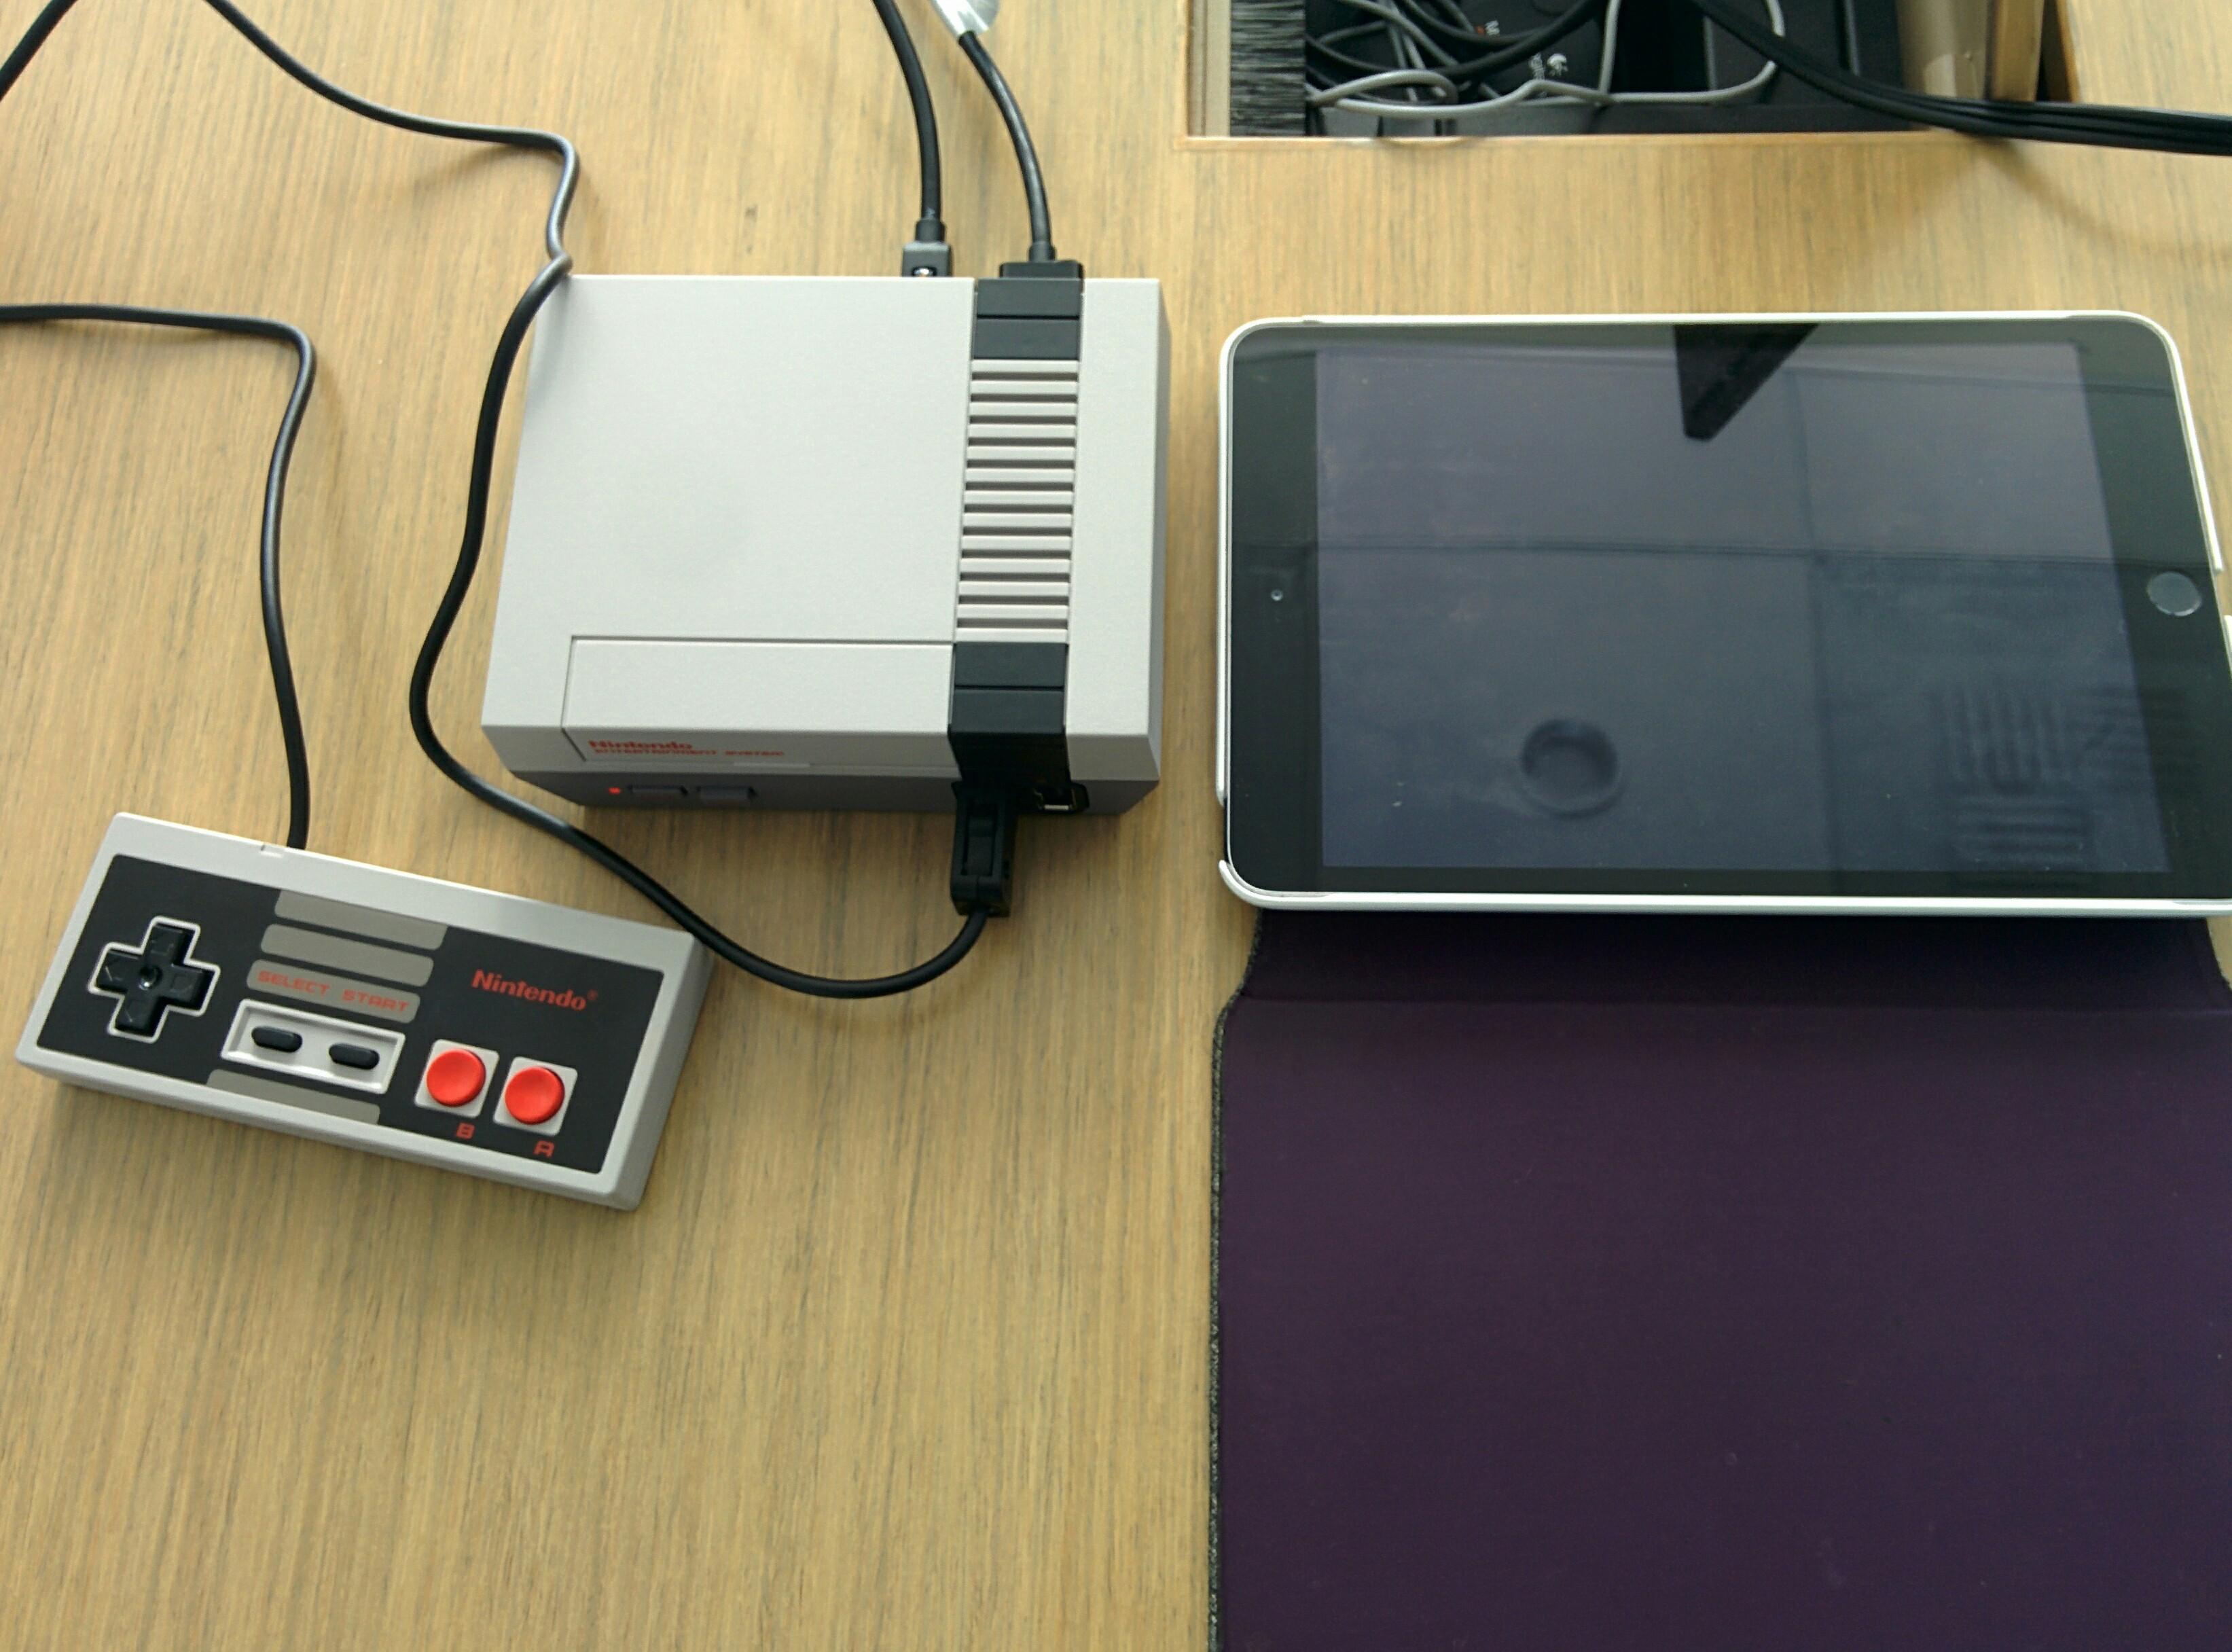 Nintendo unveils handheld Switch console